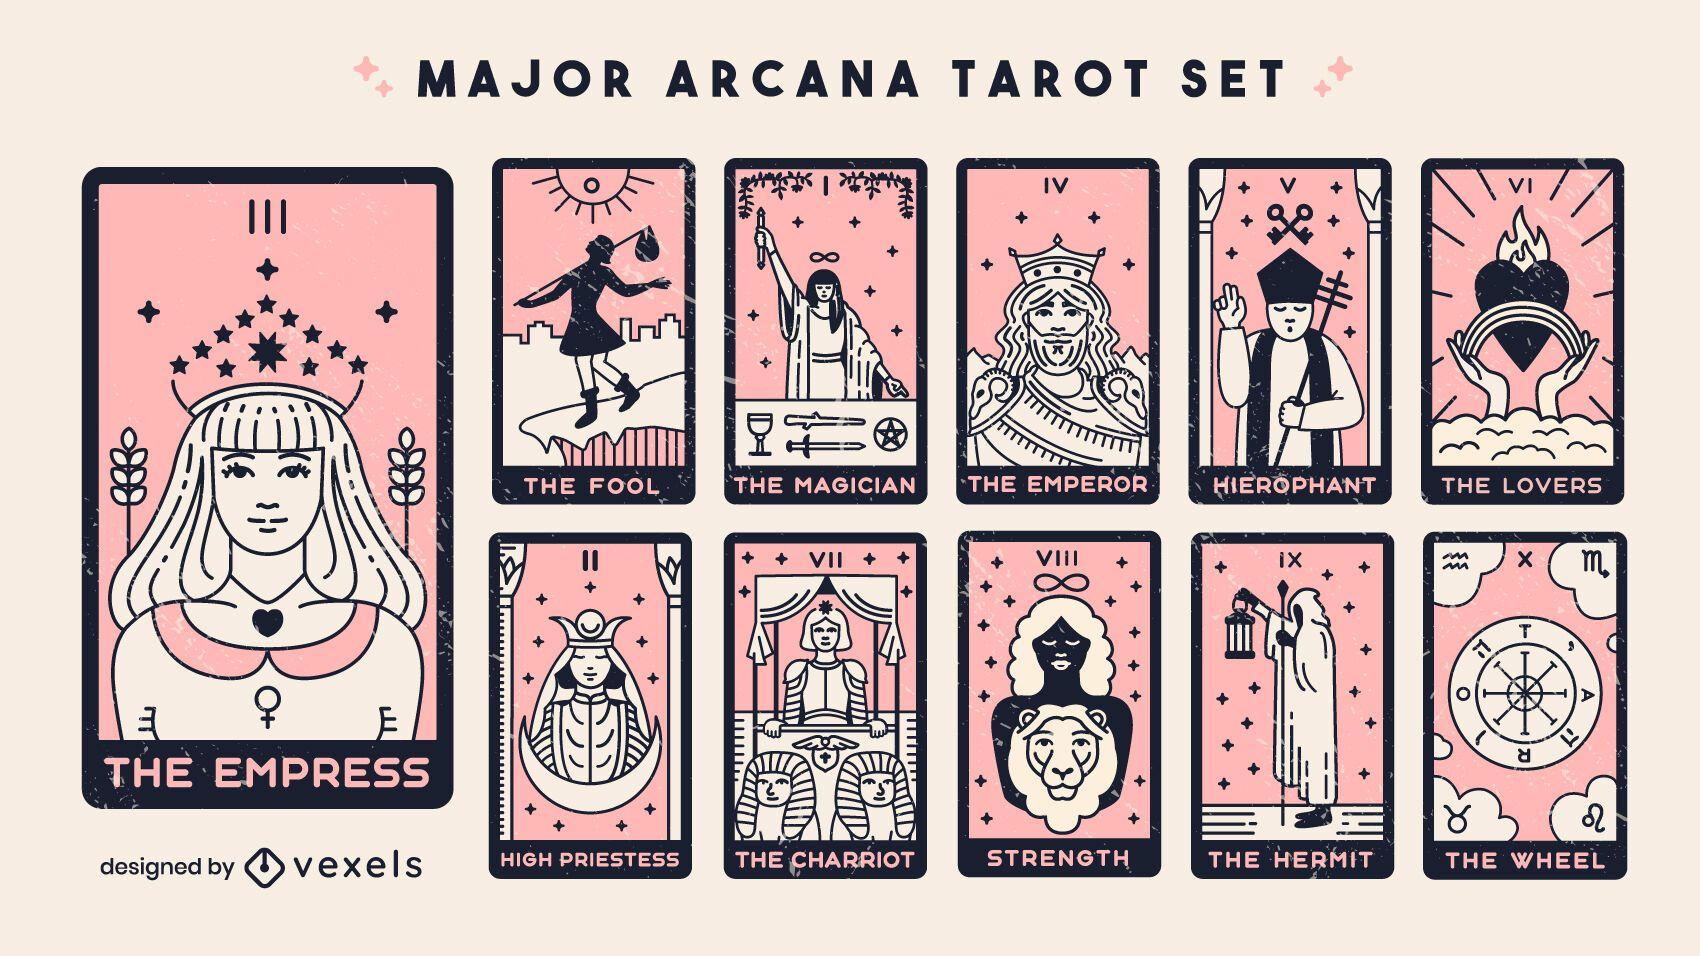 Set von großen Arkana-Tarotkarten